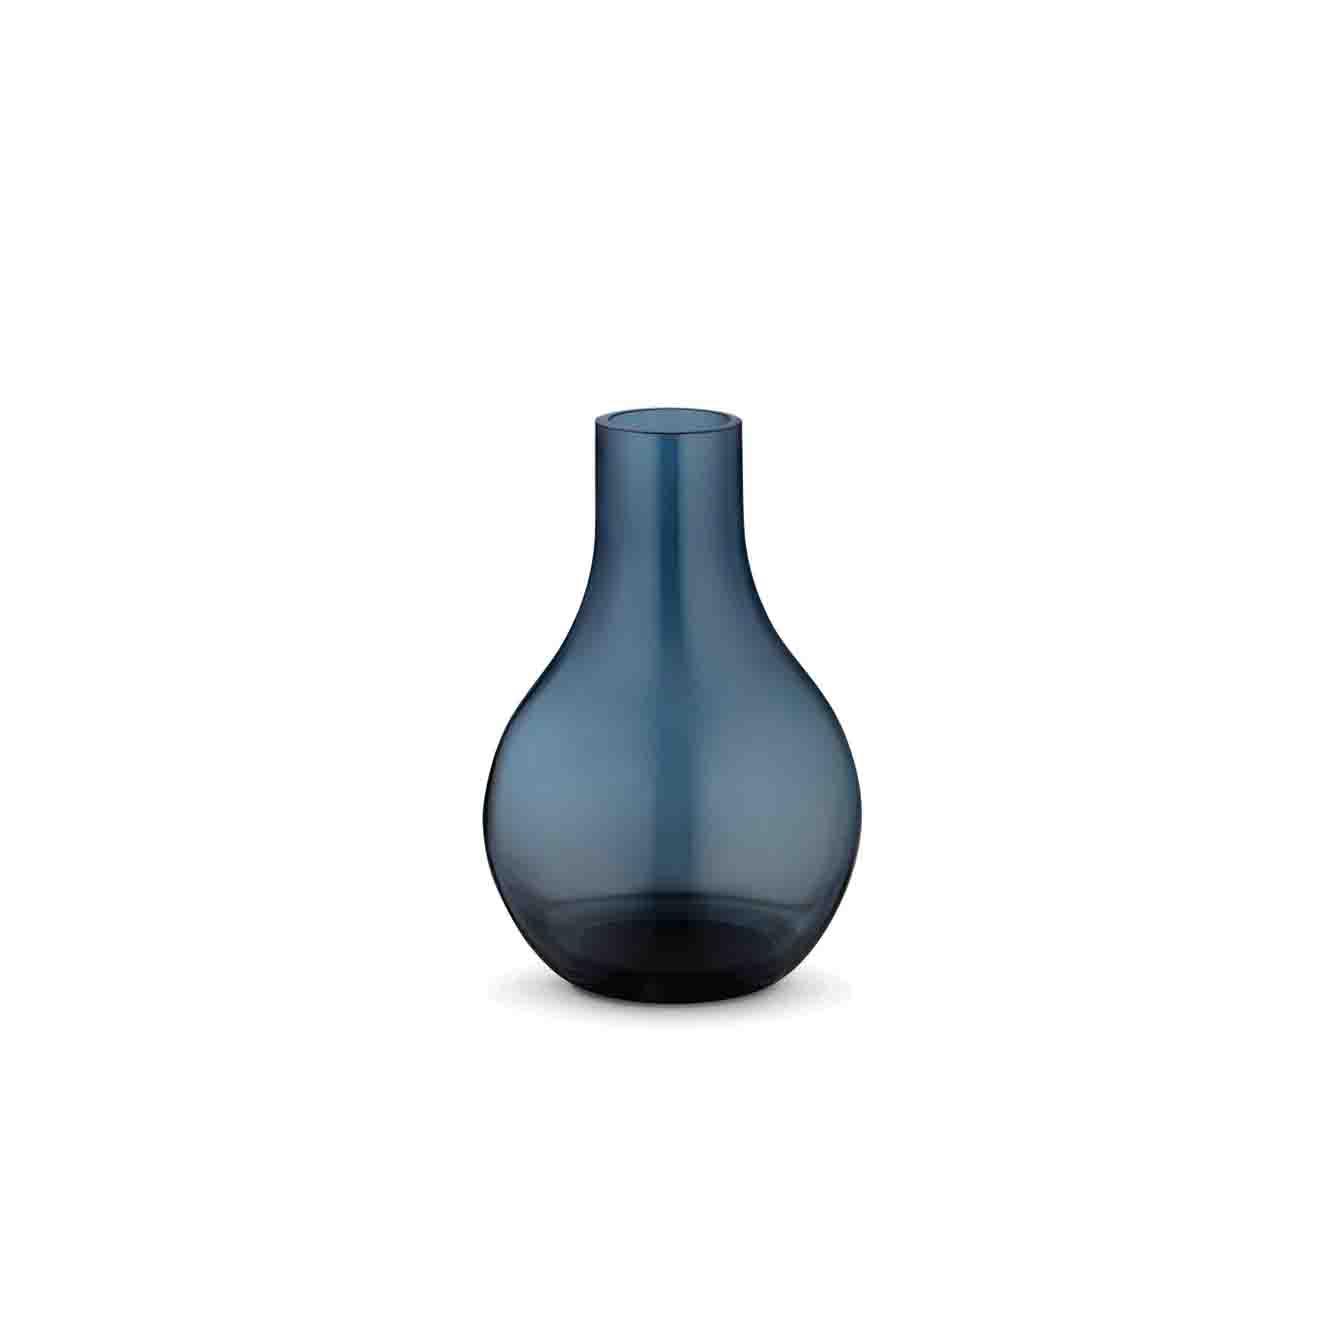 LIVING GEORG JENSEN CAFU系列 - 手工玻璃花器(小型) 建議售價NT$2,300